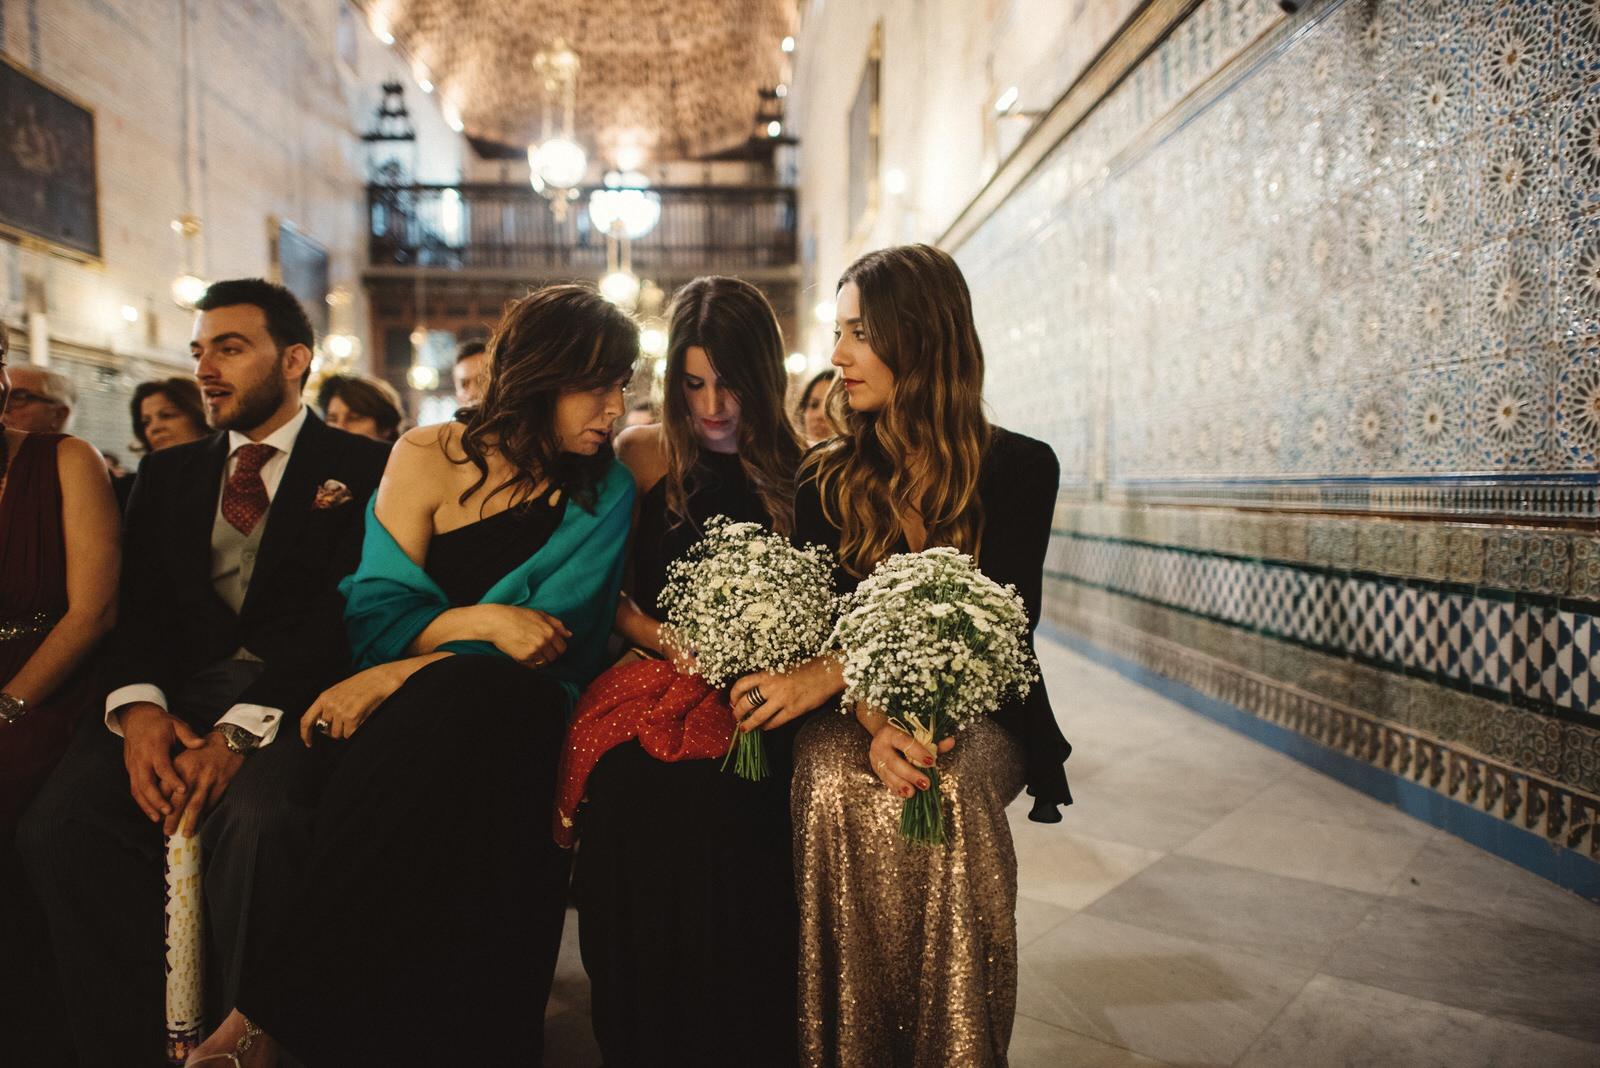 fotografo de bodas sevilla - fotografo boda - fotografía sevilla - Andrés AmarilloAAA_3063- fine.JPG